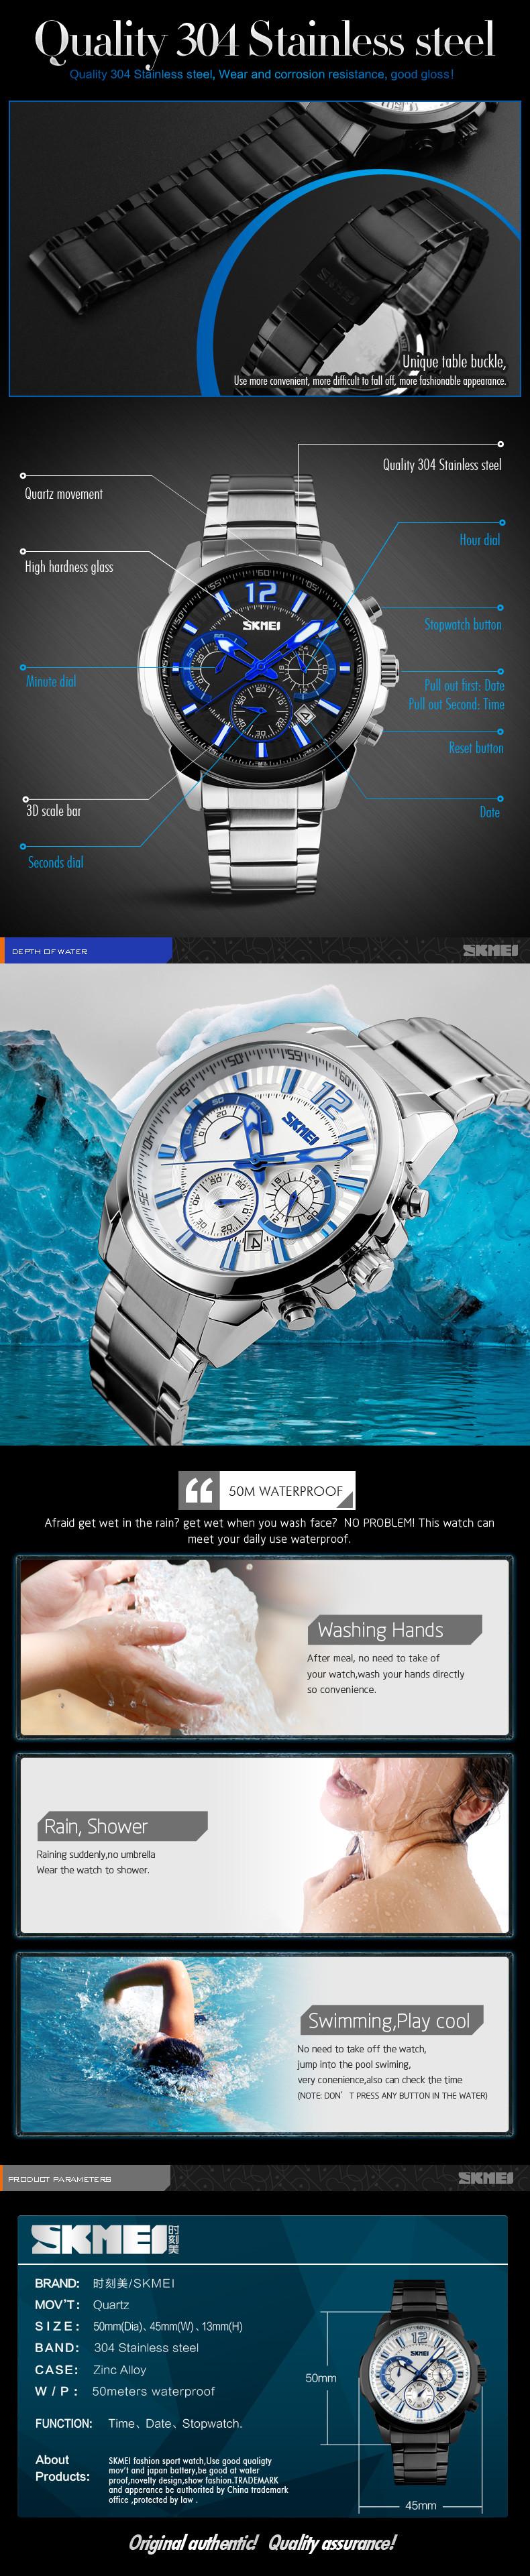 SKMEI 2016 Новая Мода Часы мужские Аналоговые Кварцевые Часы Мужчины Из Нержавеющей Стали Наручные Часы Мужчины Часы Relogio Masculino Reloj